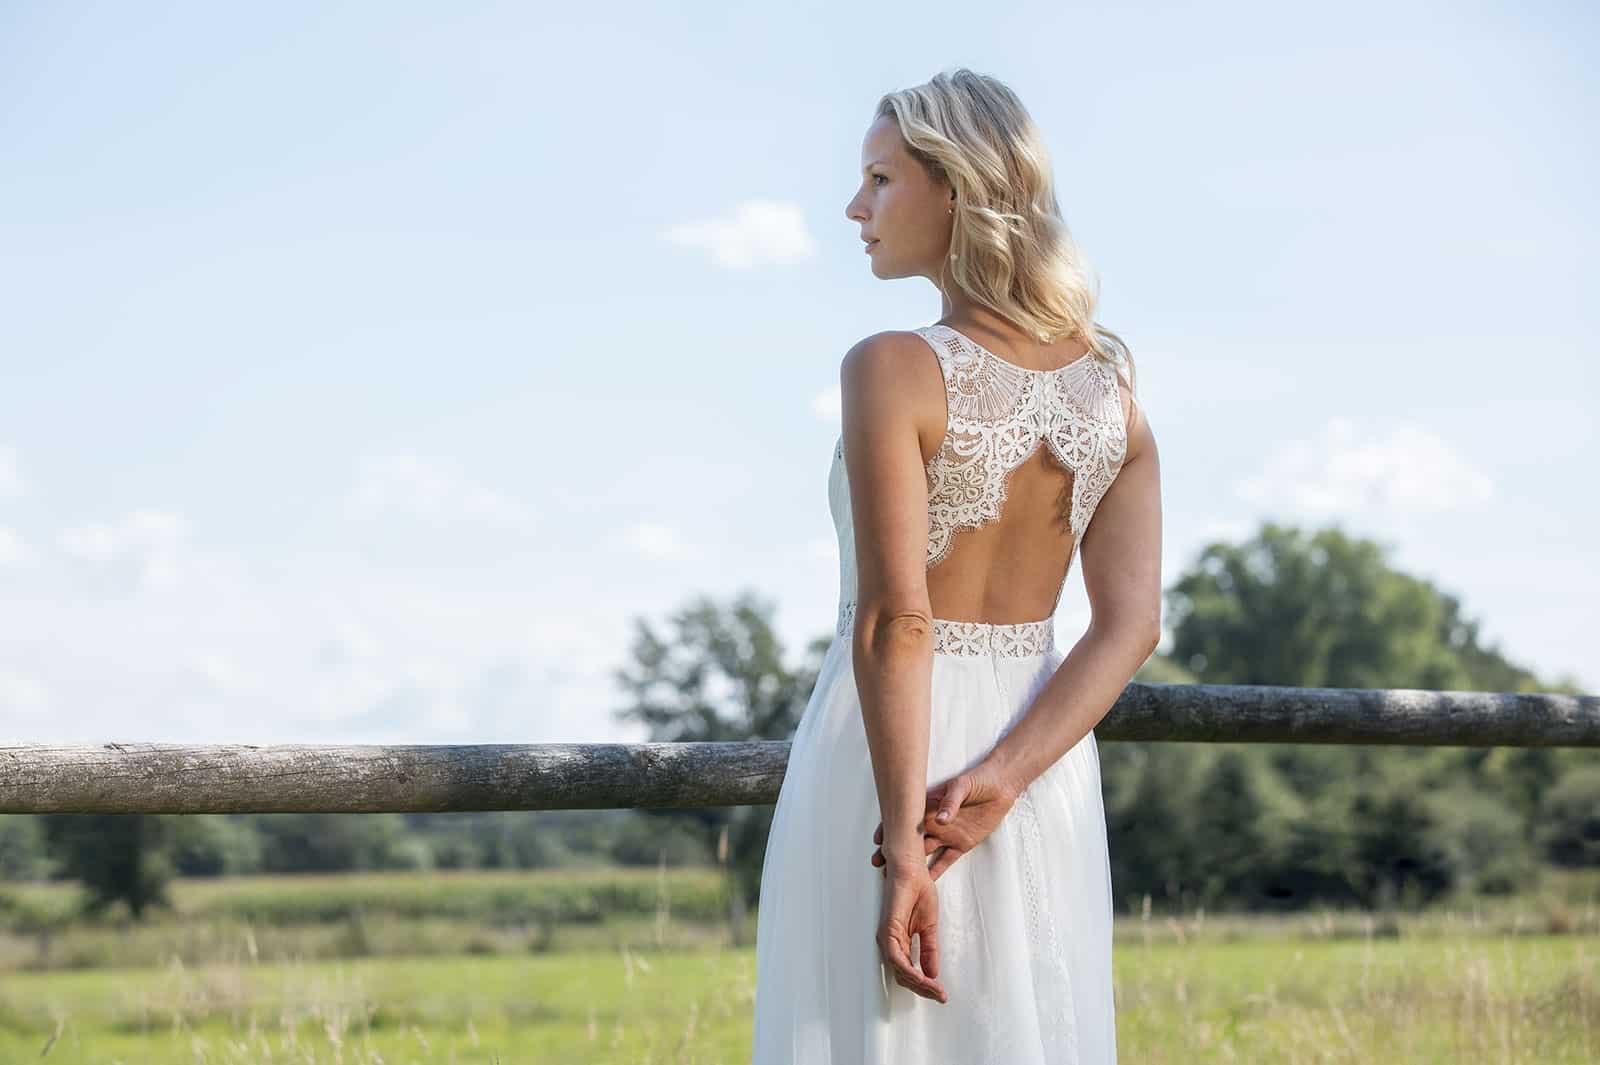 Boho-Brautkleid Spitze Rückenausschnitt